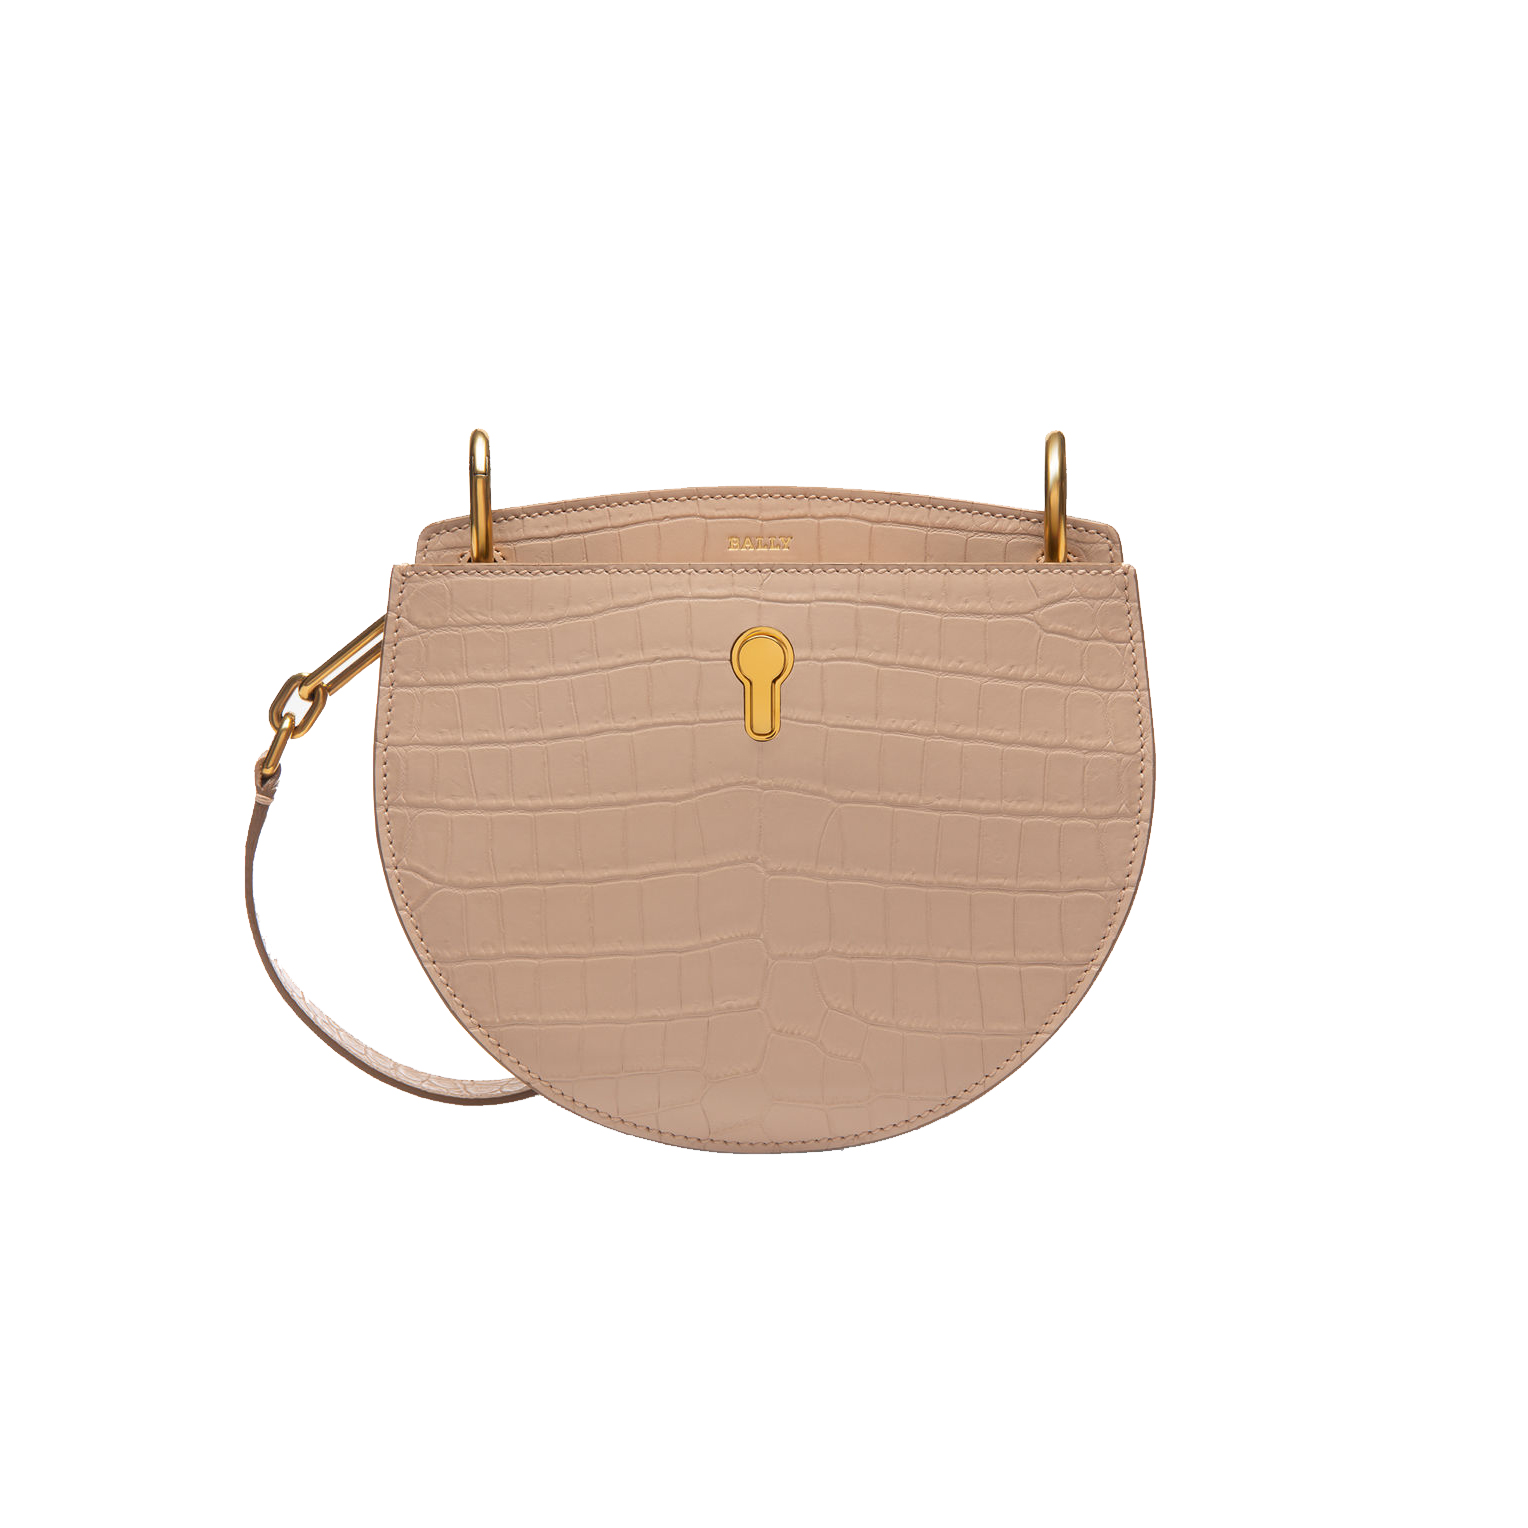 Bally Cecyle Small Crossbody Bag